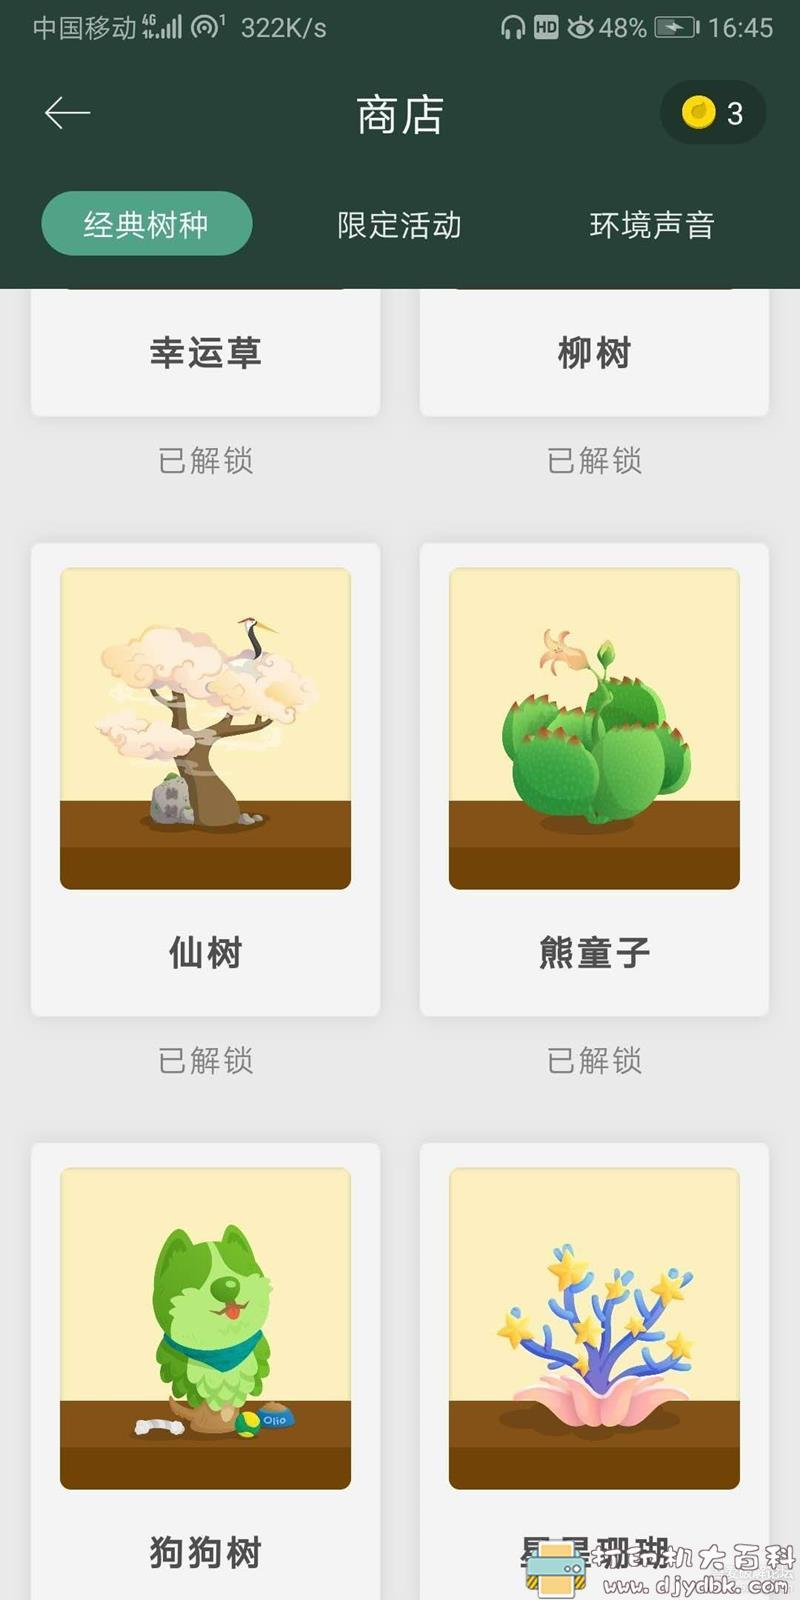 [Android]辅助你放下手机专注工作的app:Forest专注森林 v4.16.1 免费专业版图片 No.4